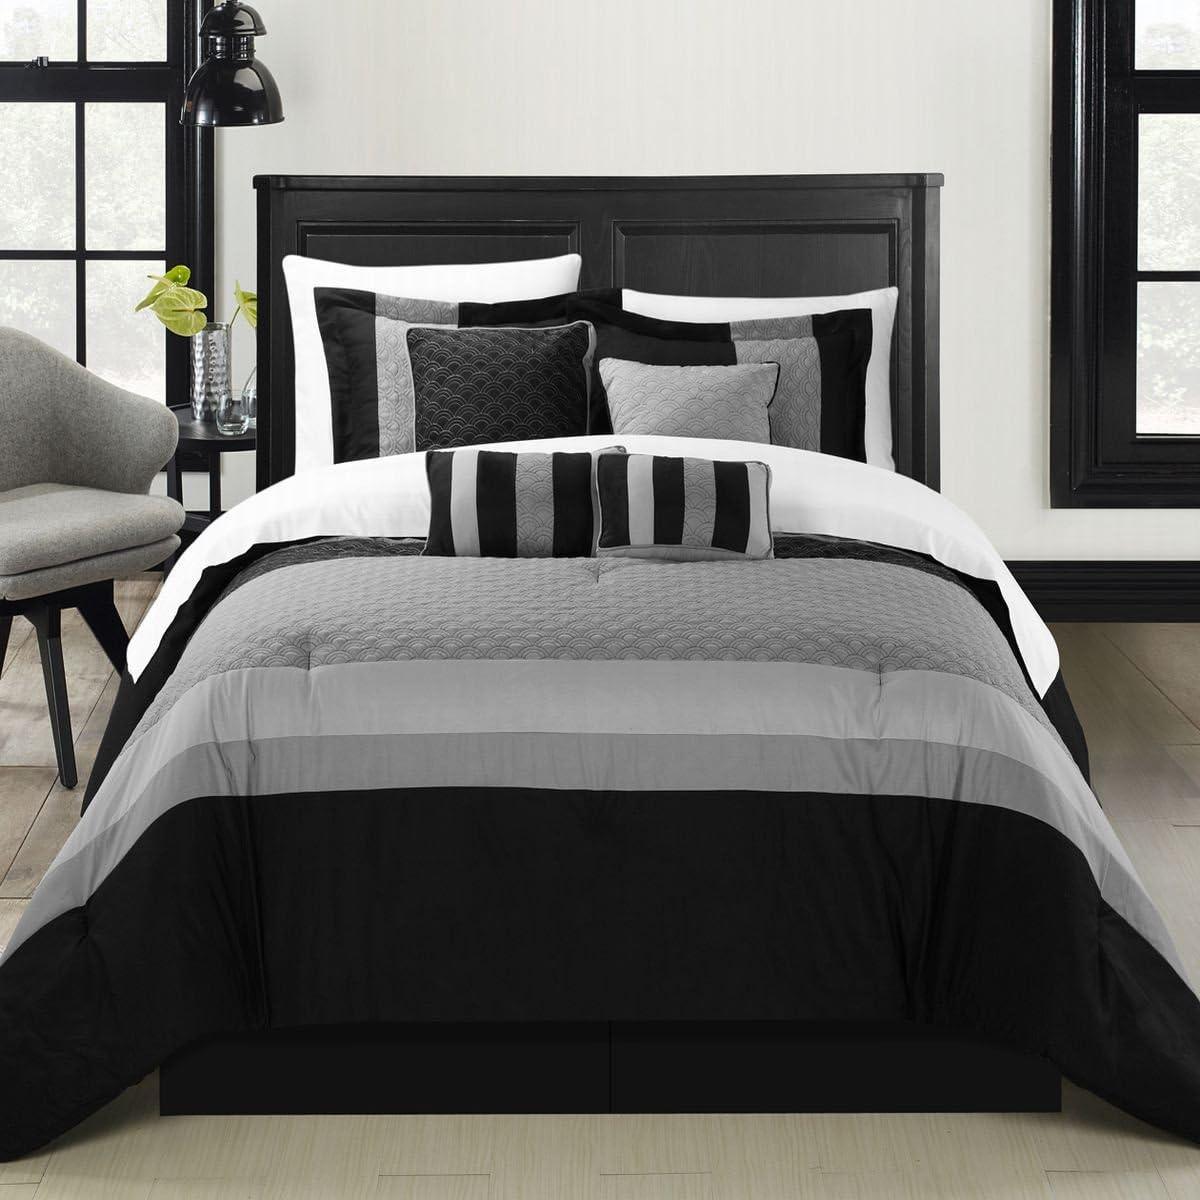 Chic Home Diamante 8-Piece Comforter Set, Queen, Black